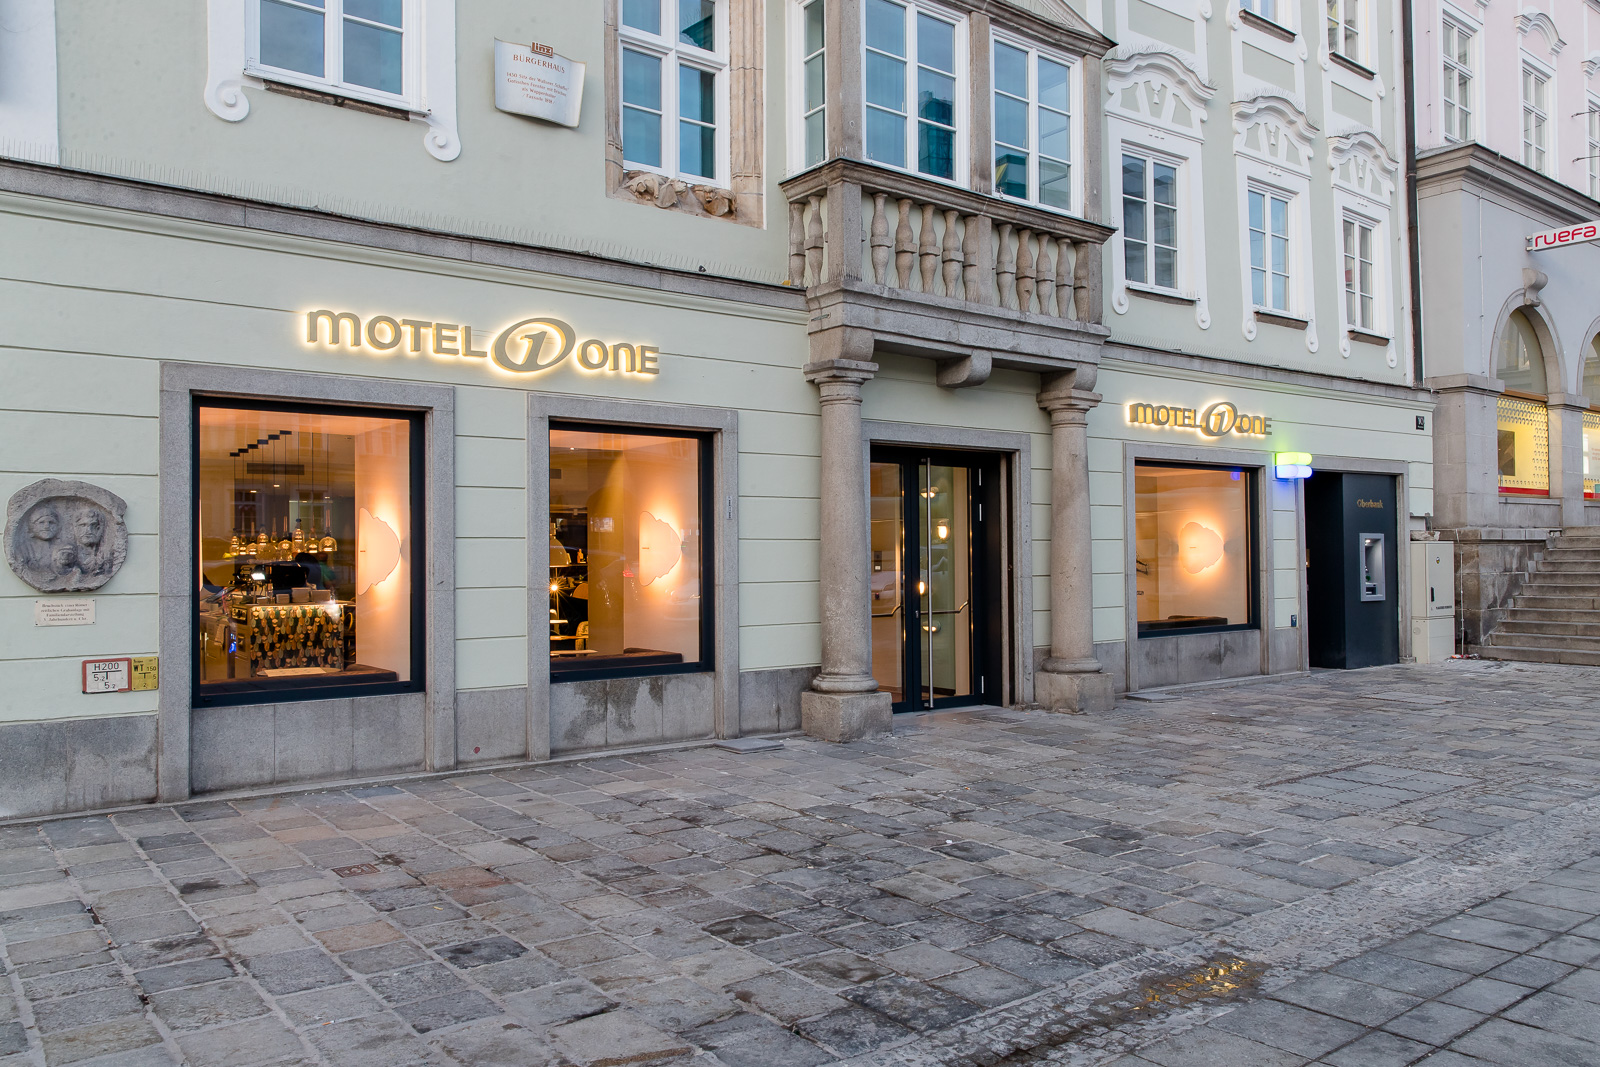 Hotel Motel One Linz-Hauptplatz